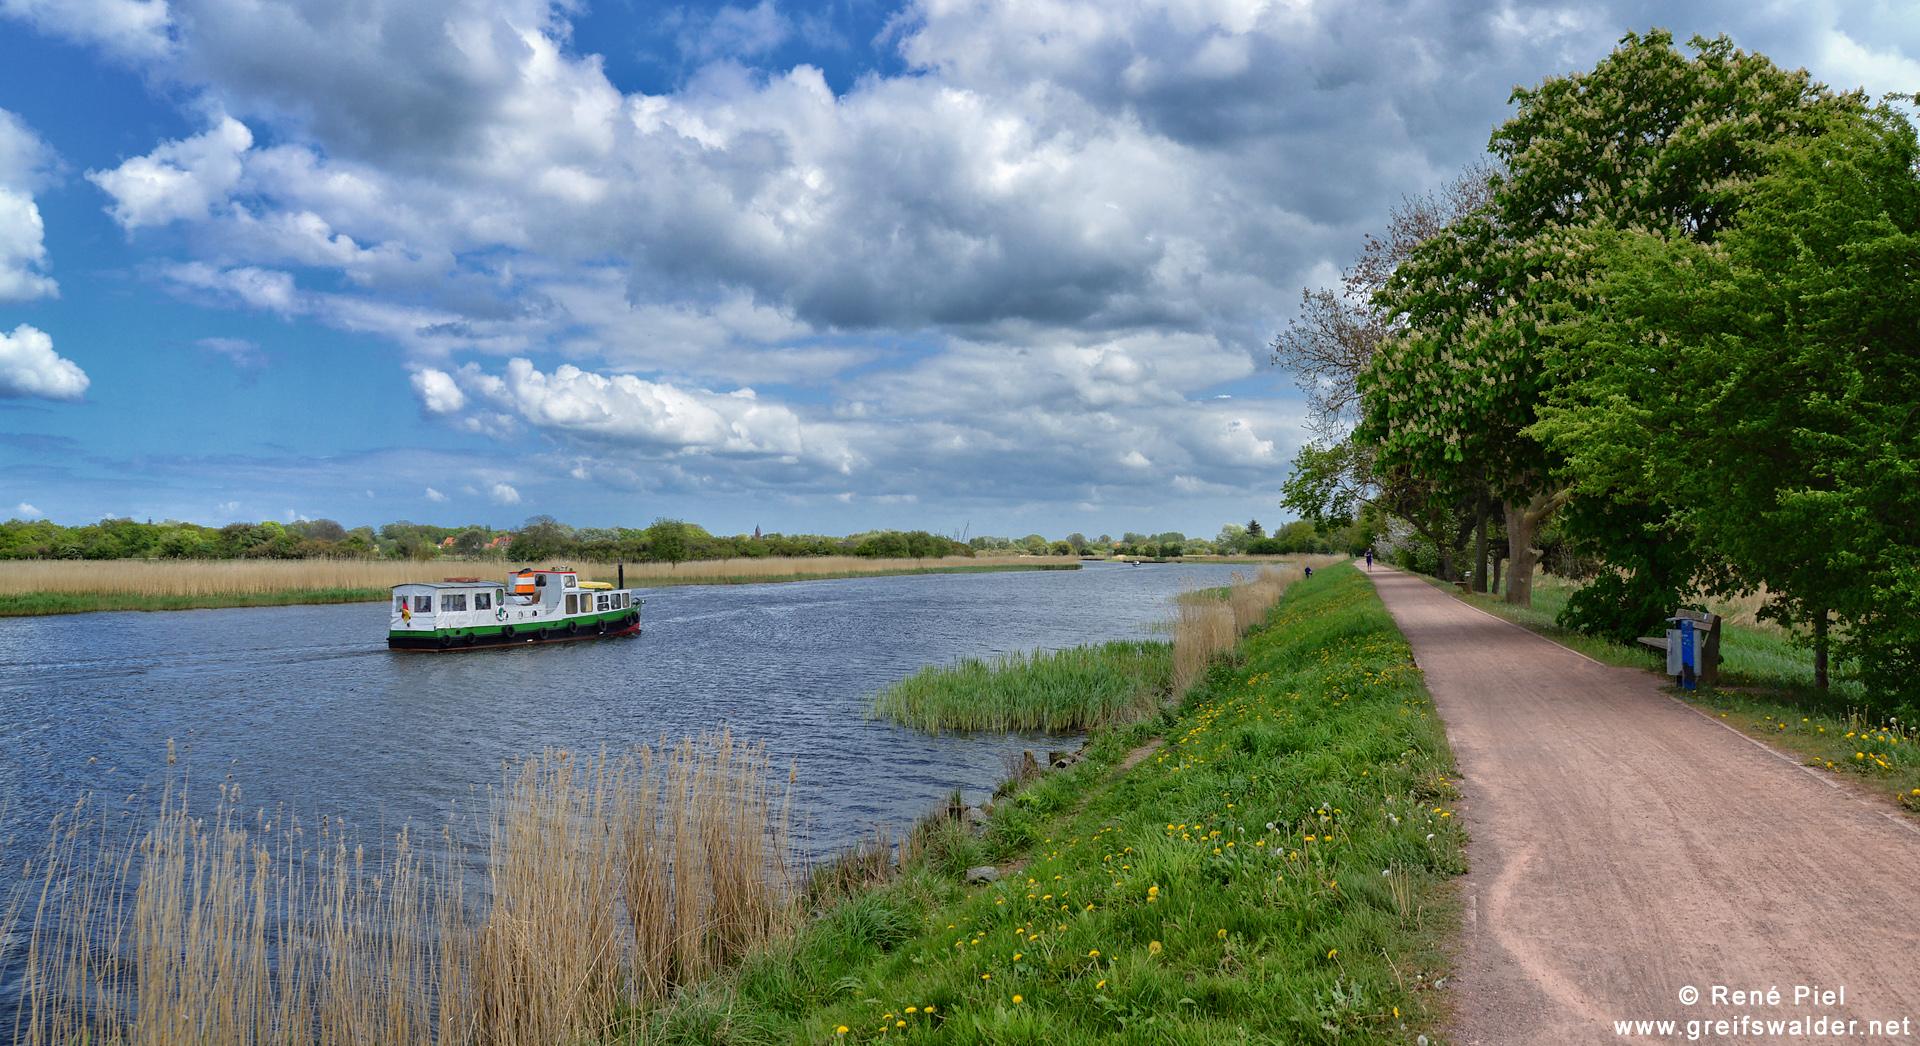 Spaziergang auf dem Treidelpfad in Greifswald